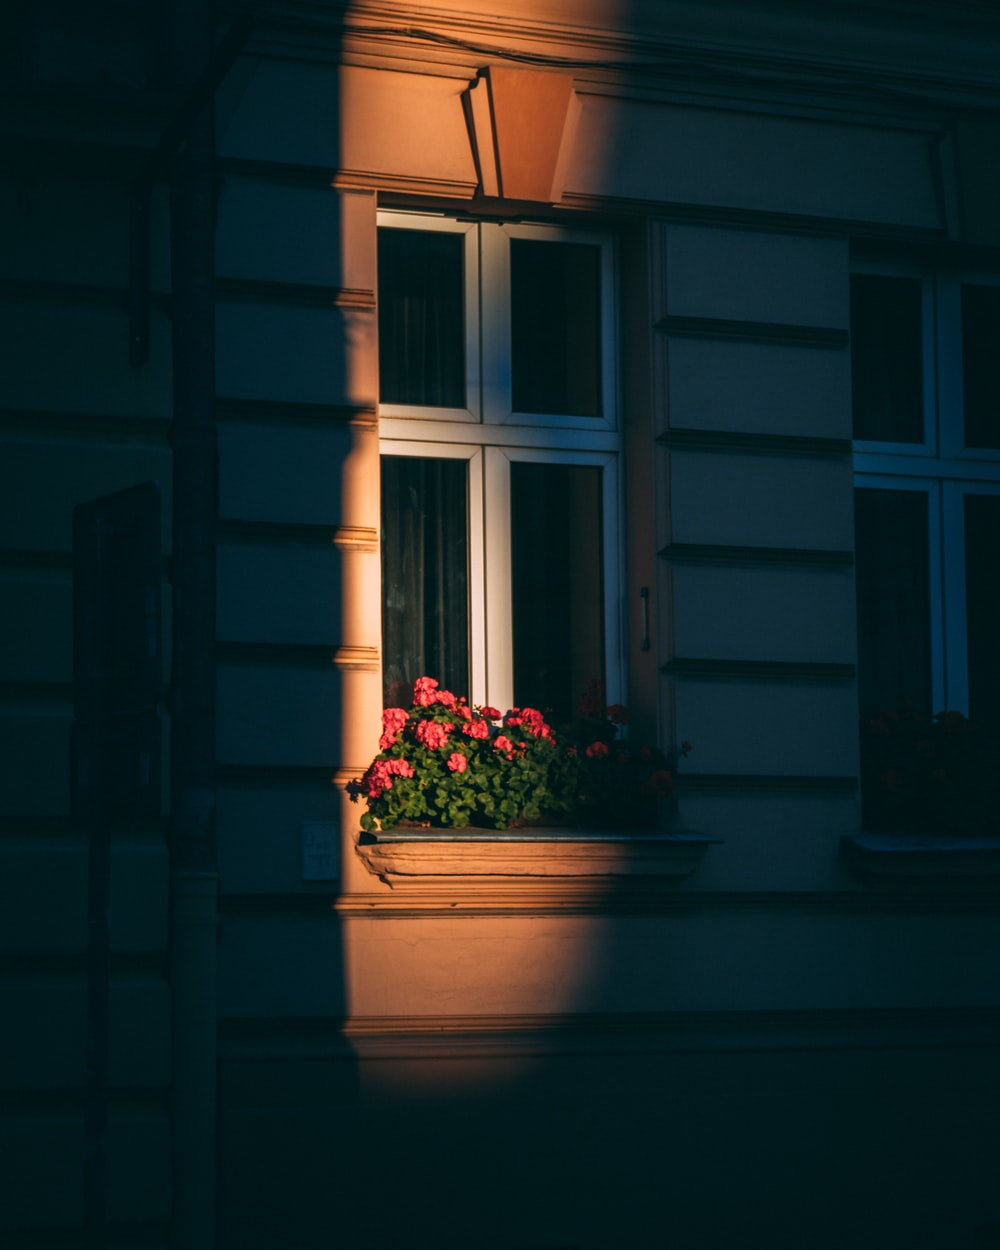 green plant on white pot beside window